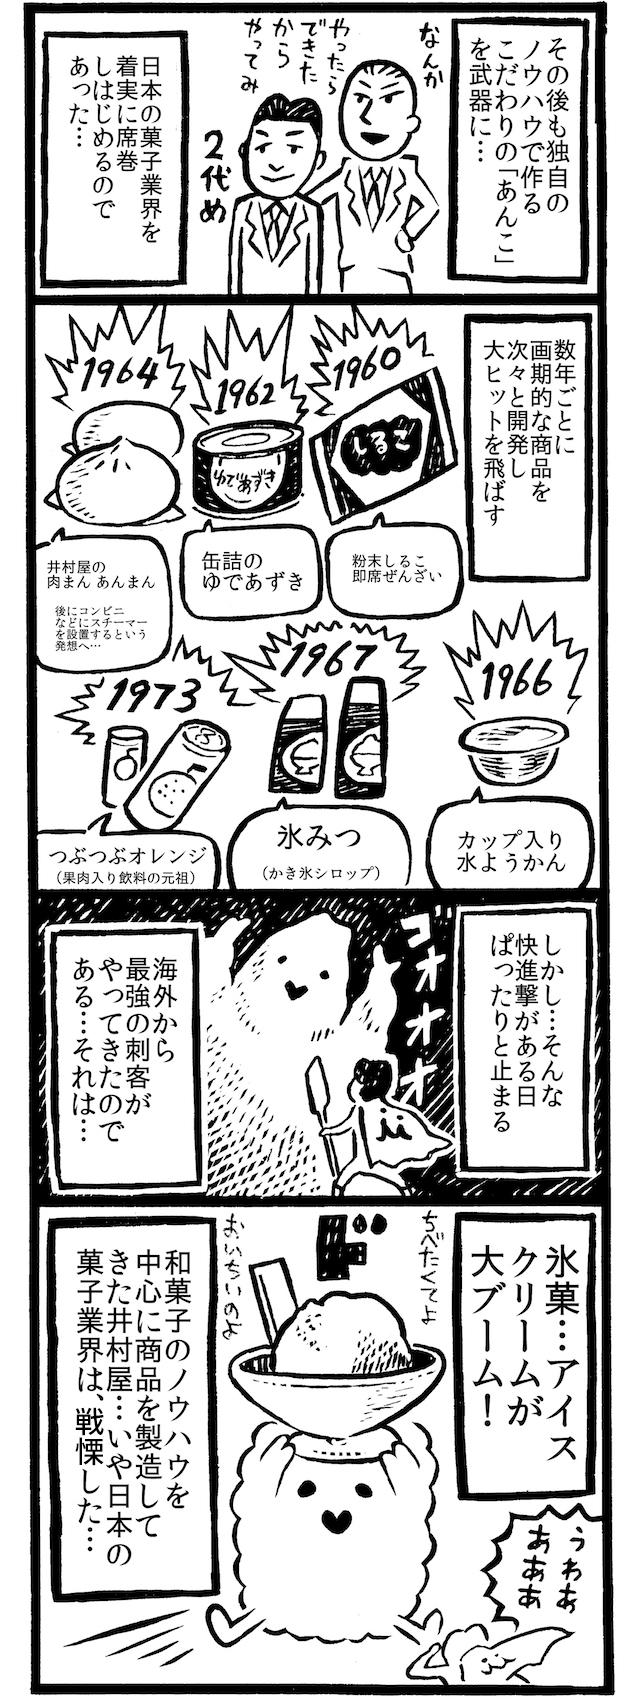 f:id:ryo_kato:20160913103337j:plain